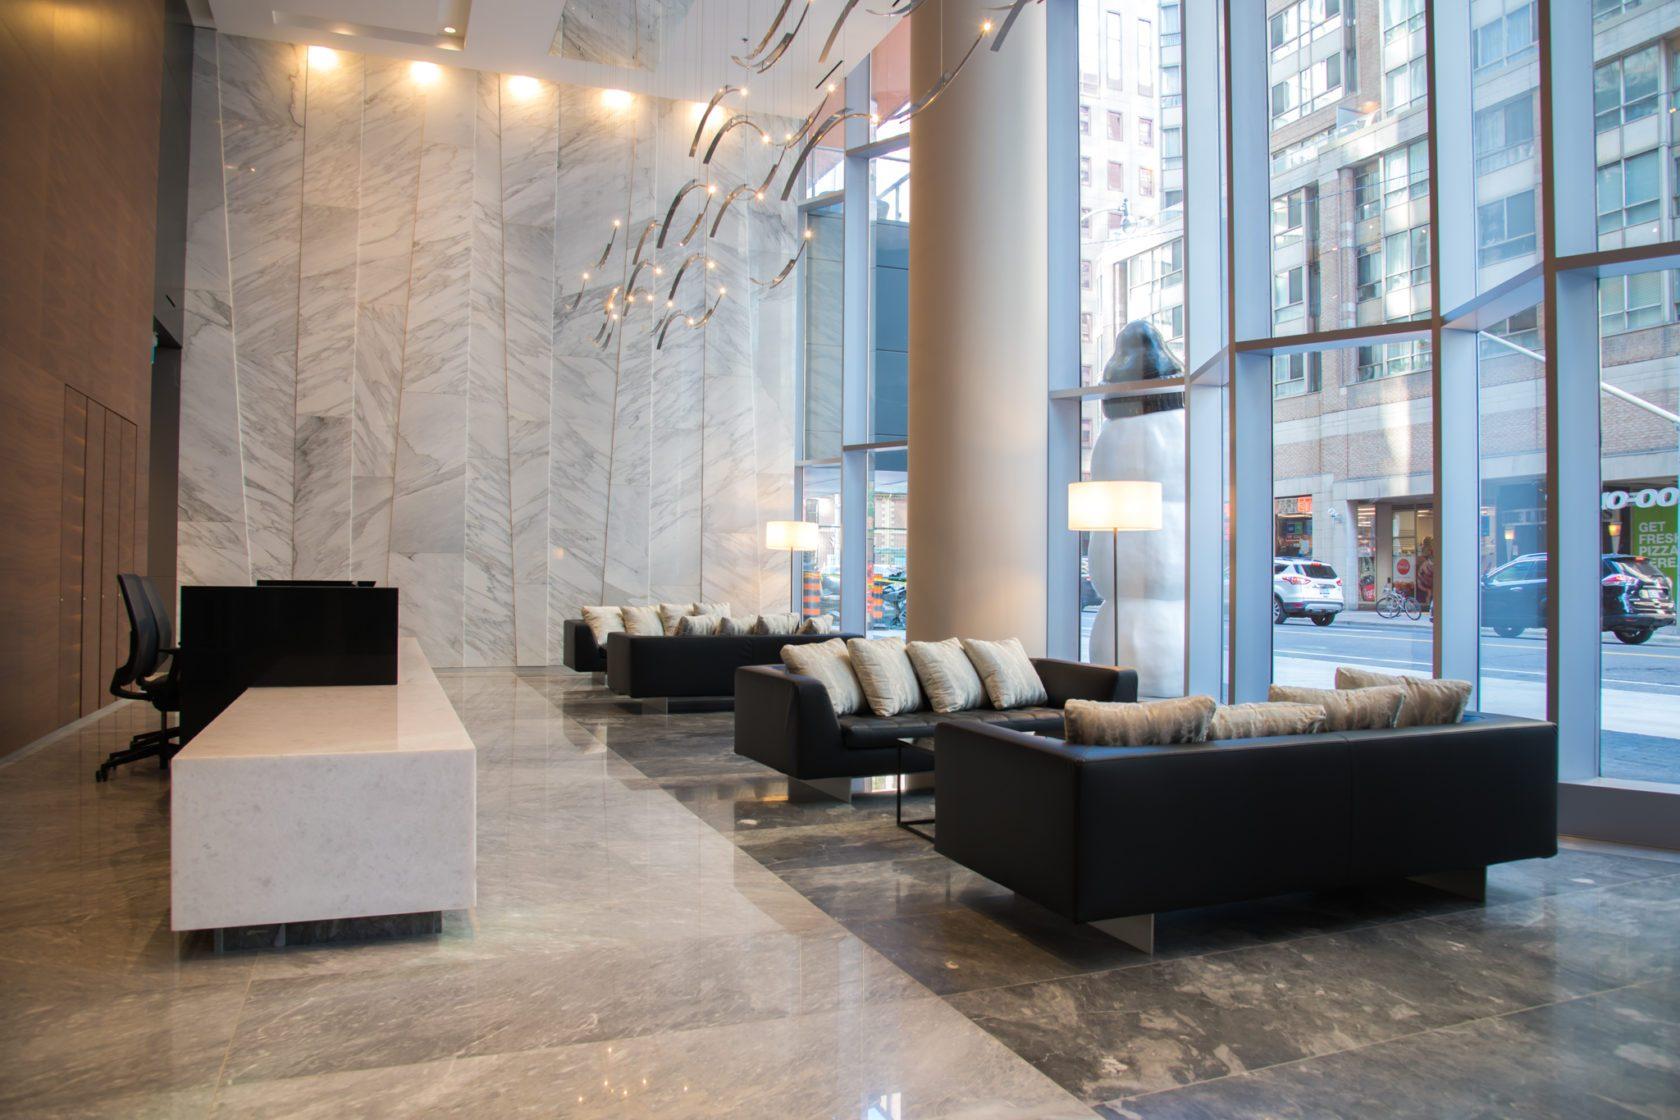 Luxury lobby with high ceilings